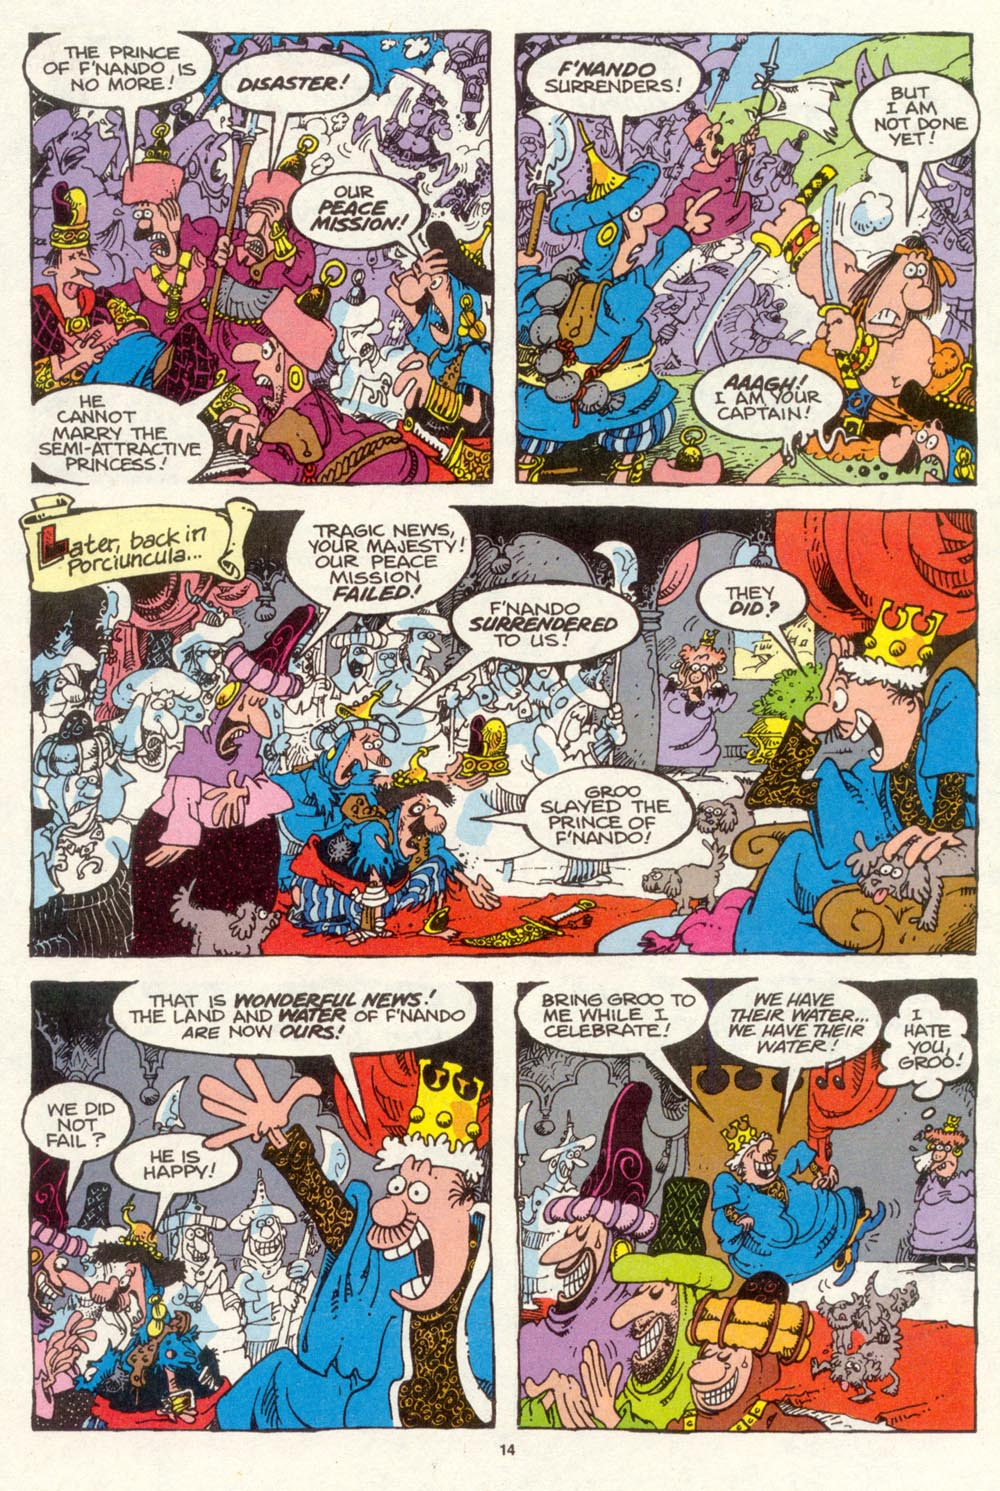 Read online Sergio Aragonés Groo the Wanderer comic -  Issue #94 - 15